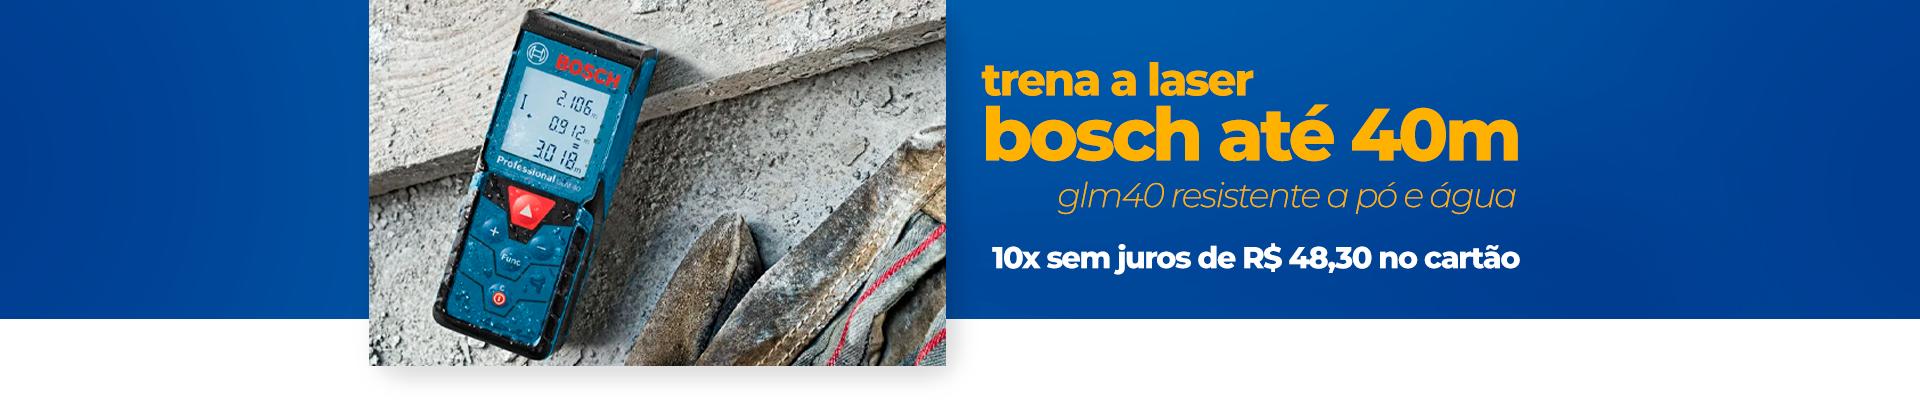 JUNHO - Trena Bosch